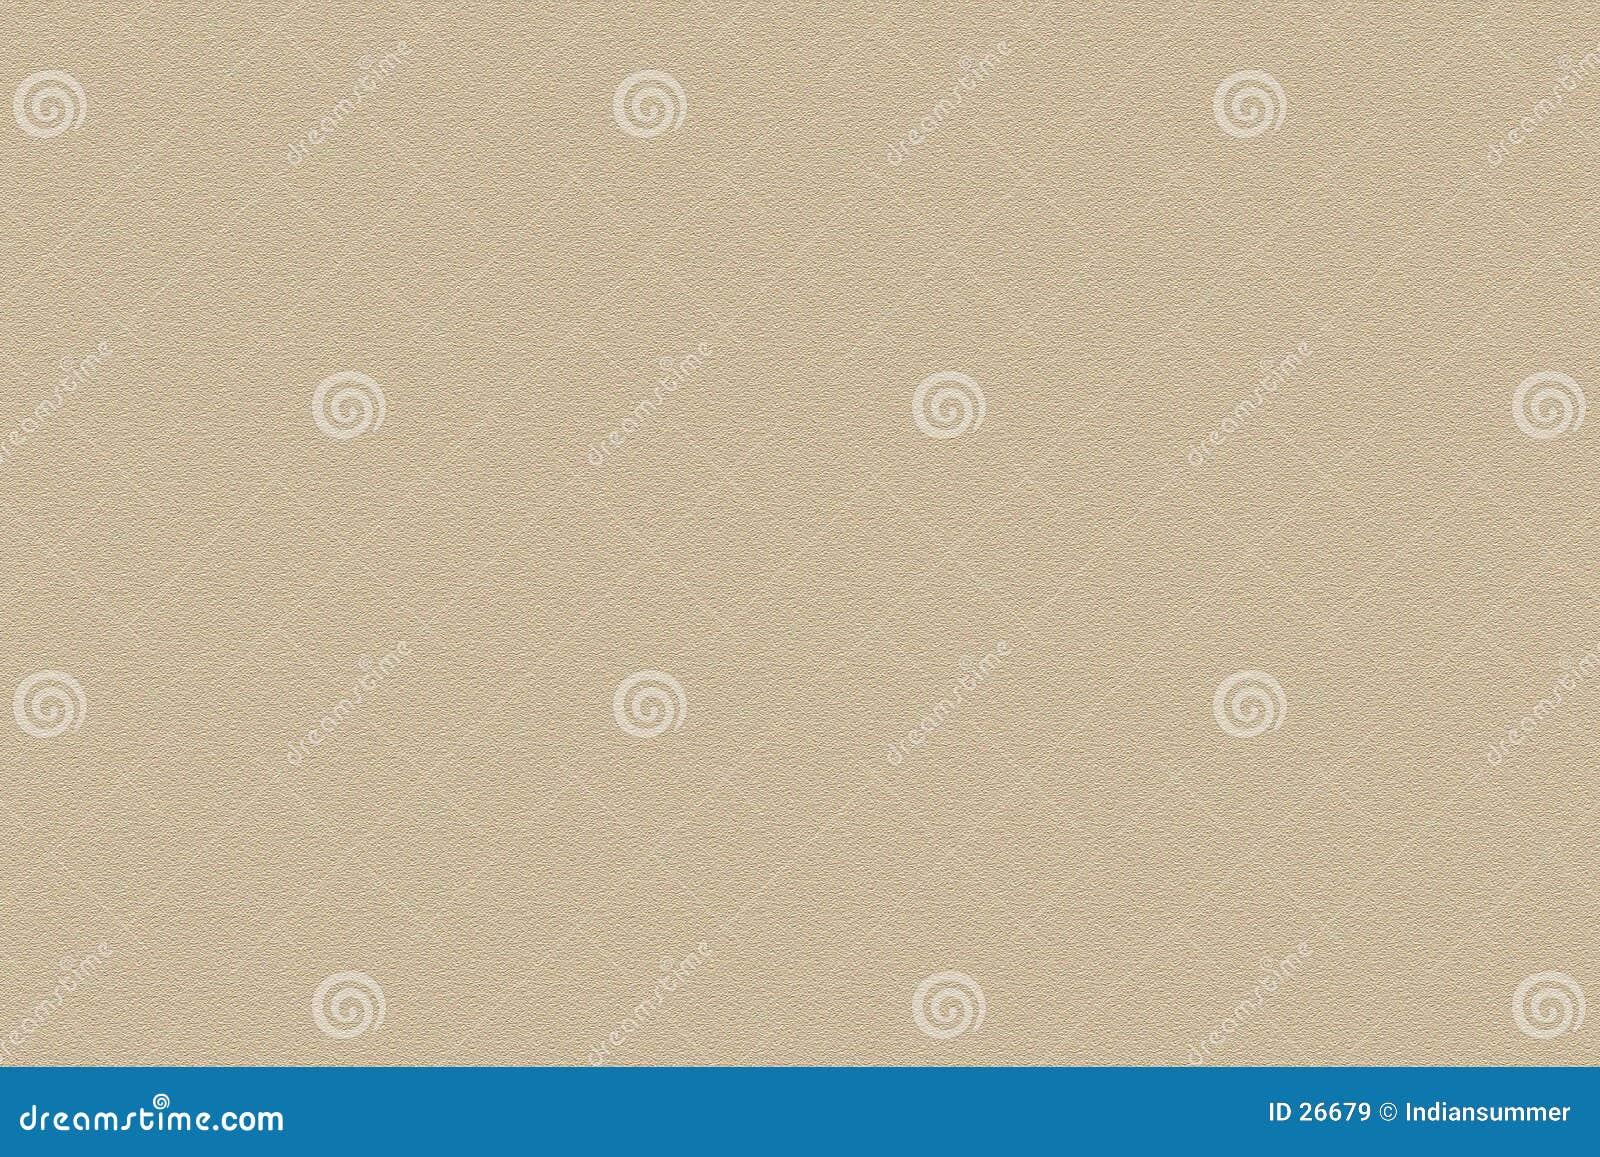 Texture - sandpaper